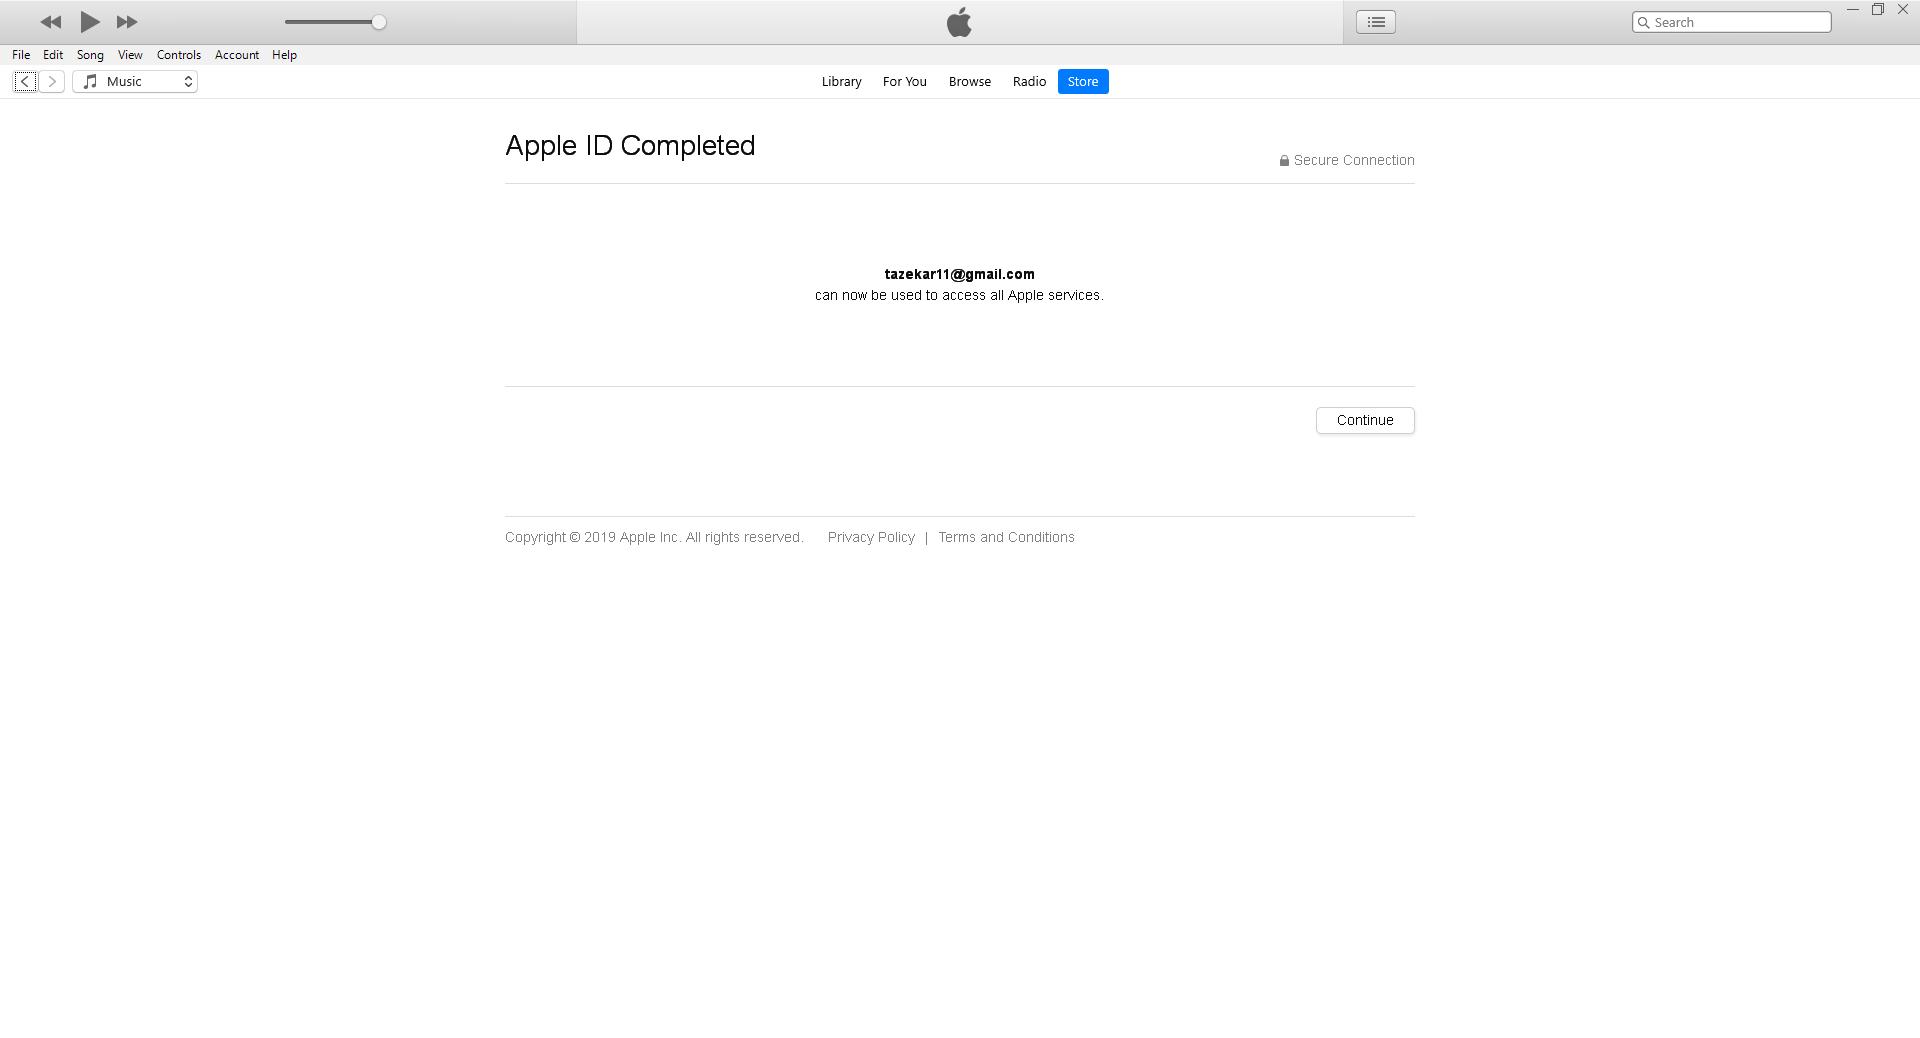 ساخت اپل آیدی